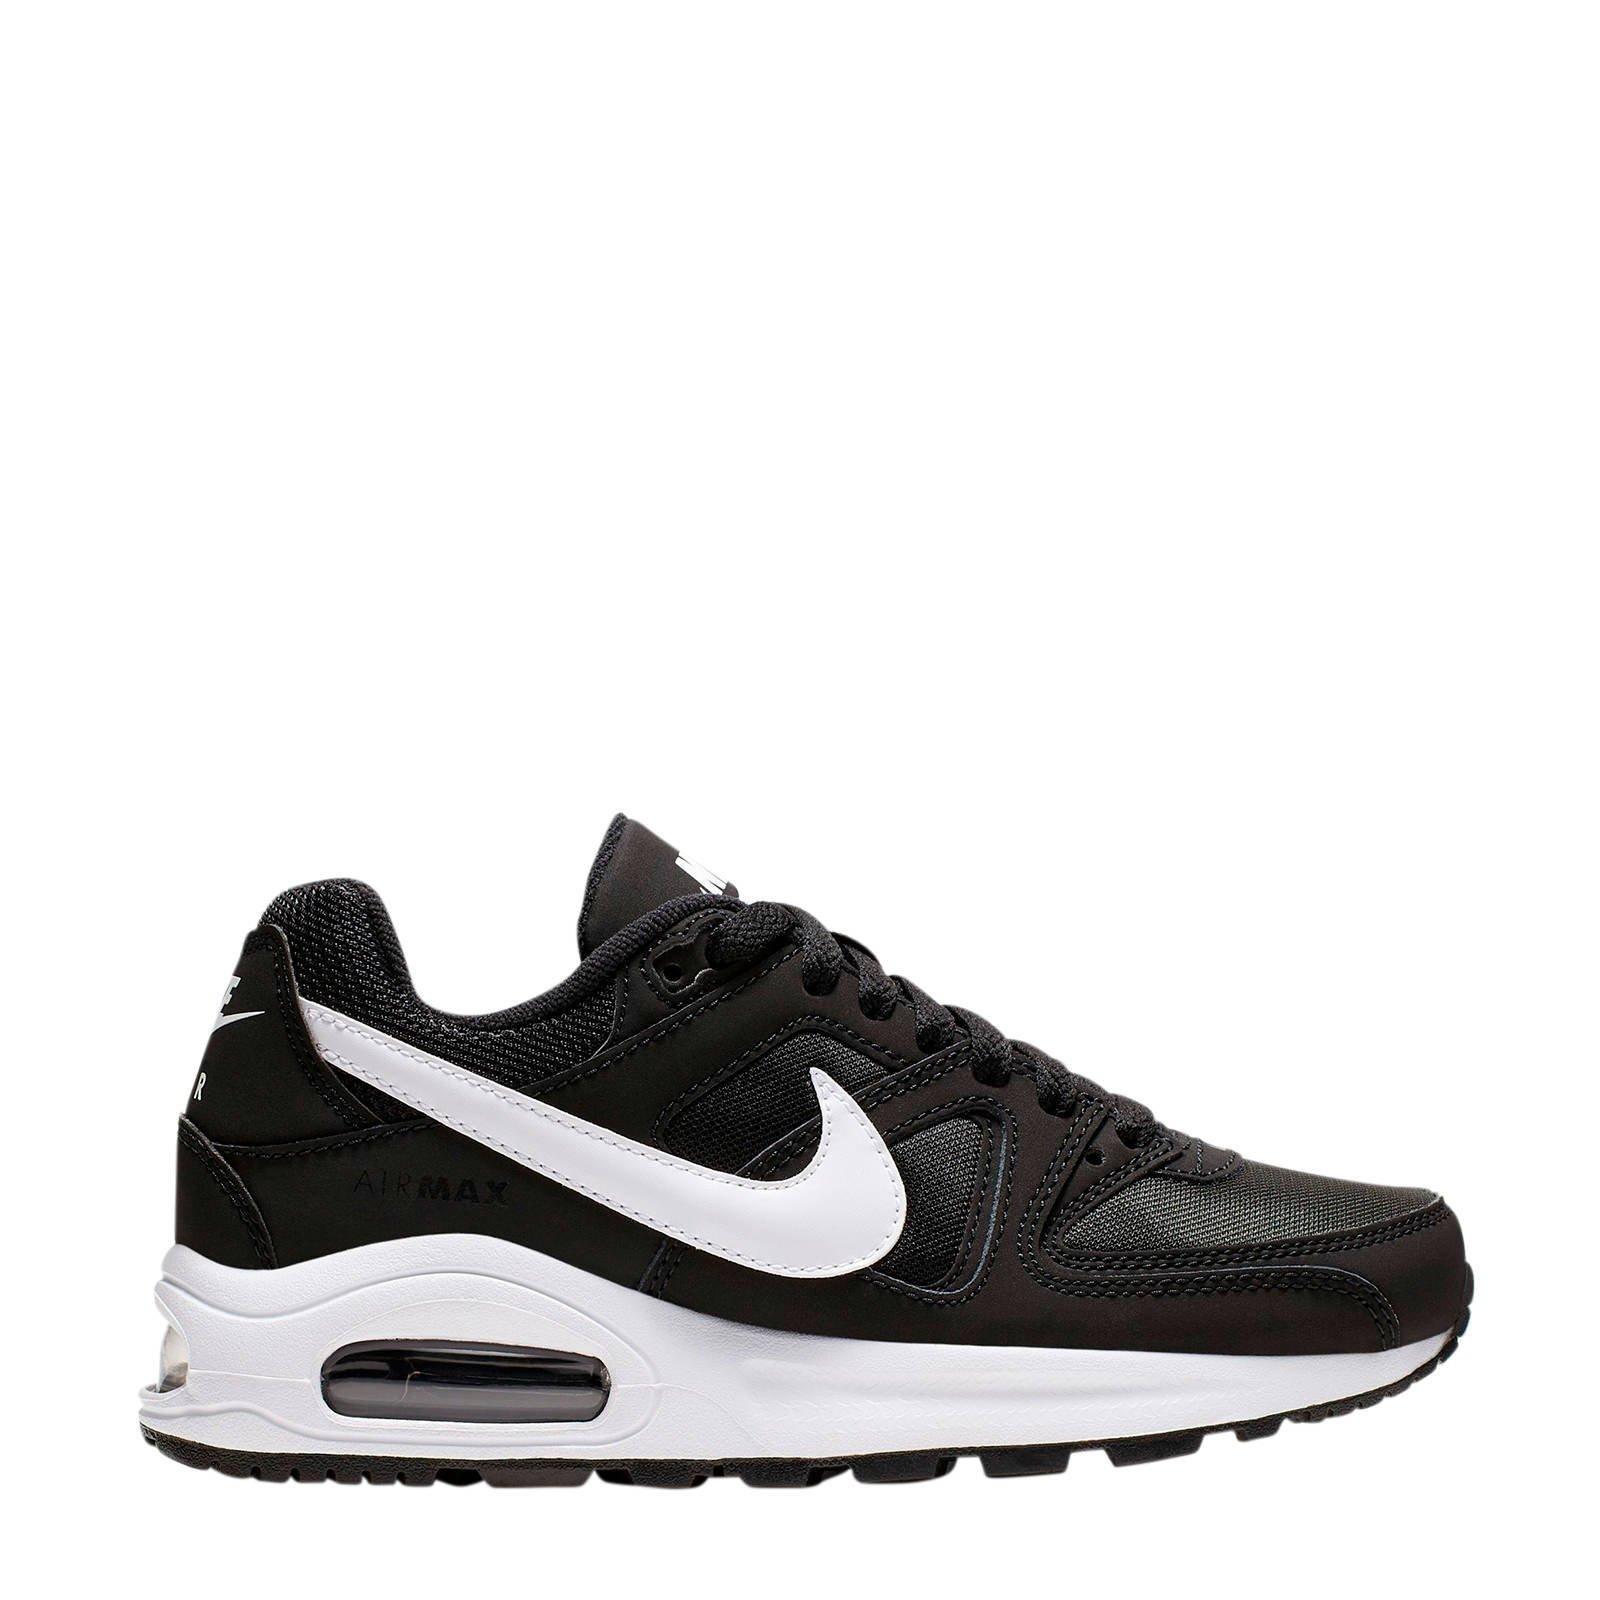 Nike Command Air Max FlexgsSneakers ZwartwitWehkamp WD9EIH2